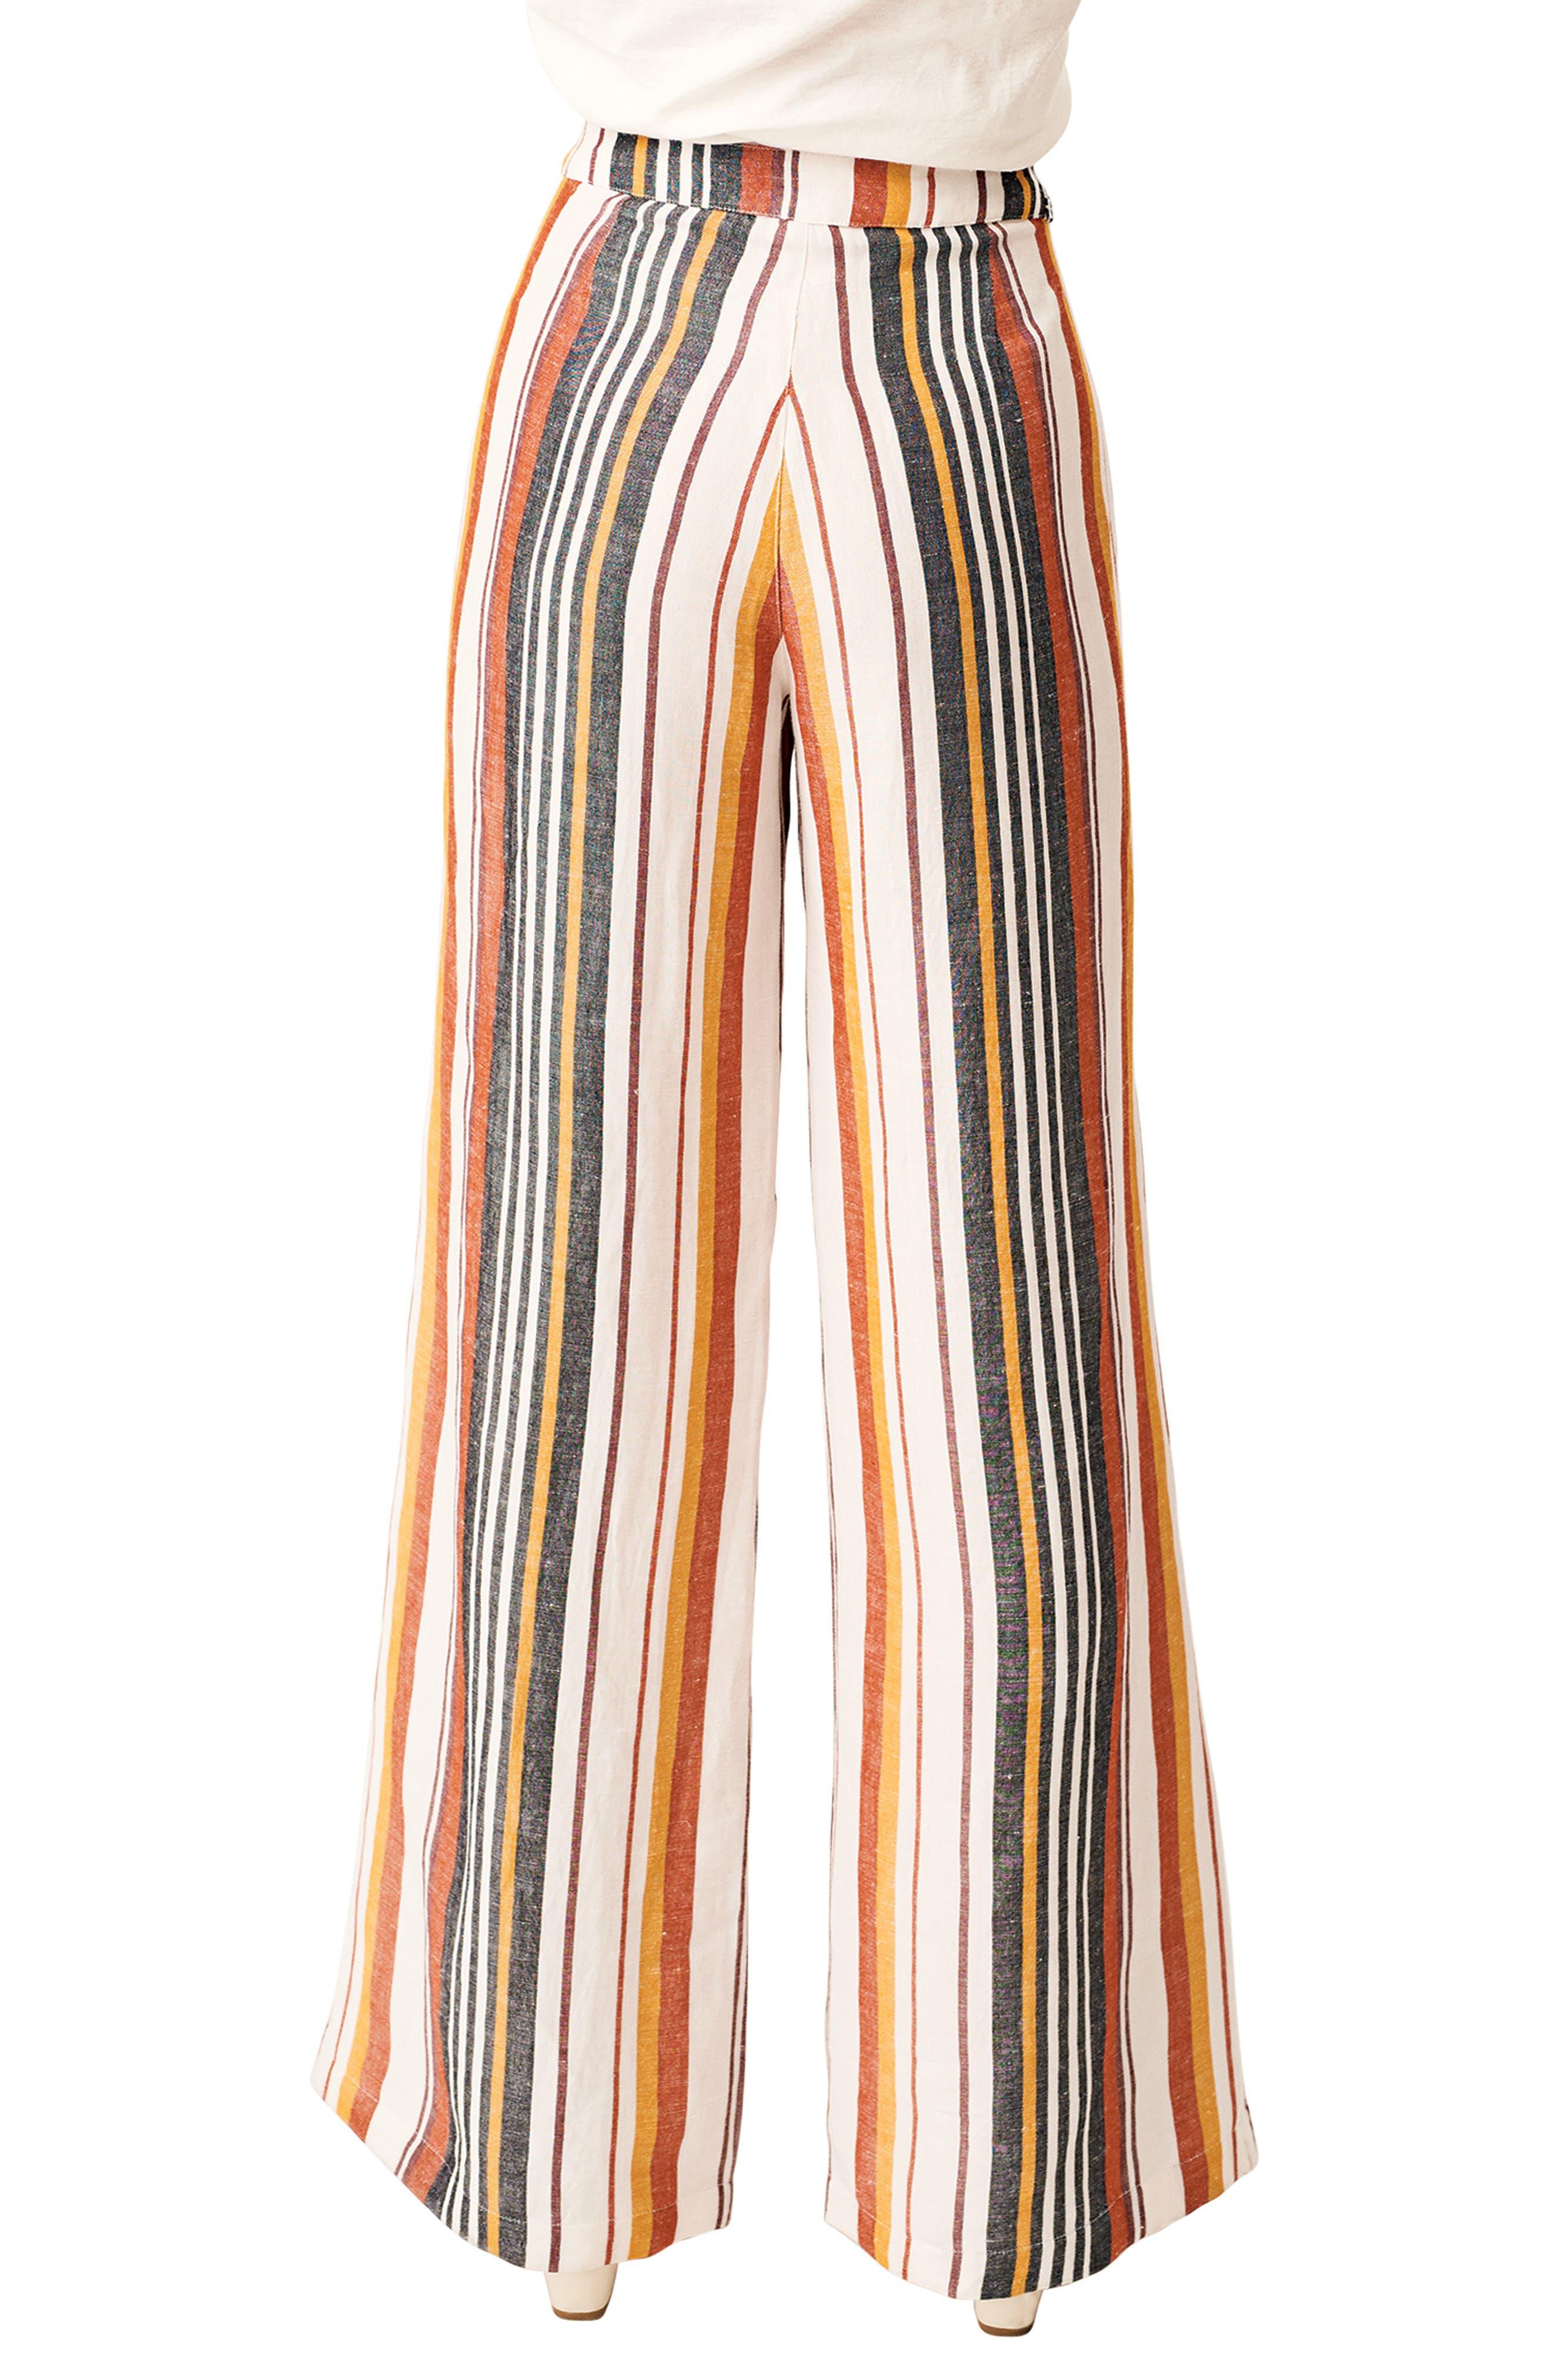 Hook It Up Stripe Pants,                             Alternate thumbnail 2, color,                             MULTI